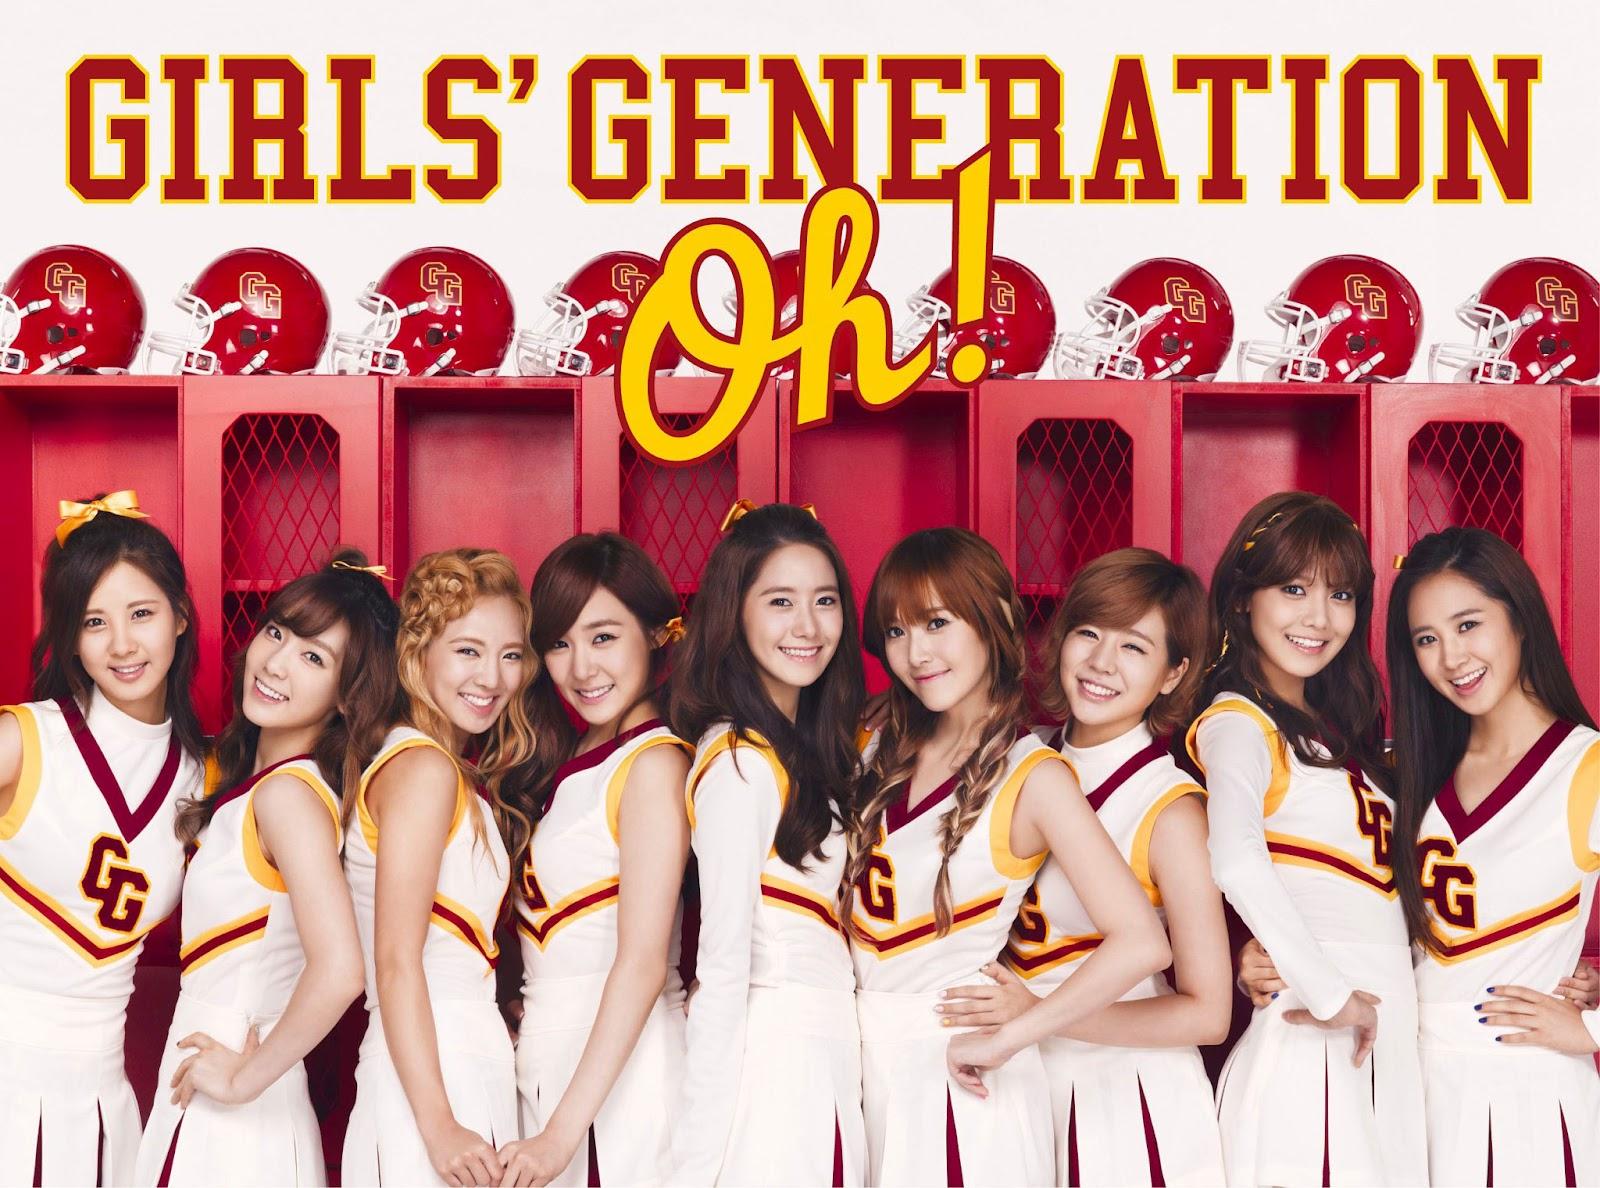 http://2.bp.blogspot.com/-EbcIbEuRGnc/UGORnTqjelI/AAAAAAAABKE/y5W3G6XN6JE/s1600/girlsgeneration-oh-hd-photo.jpg